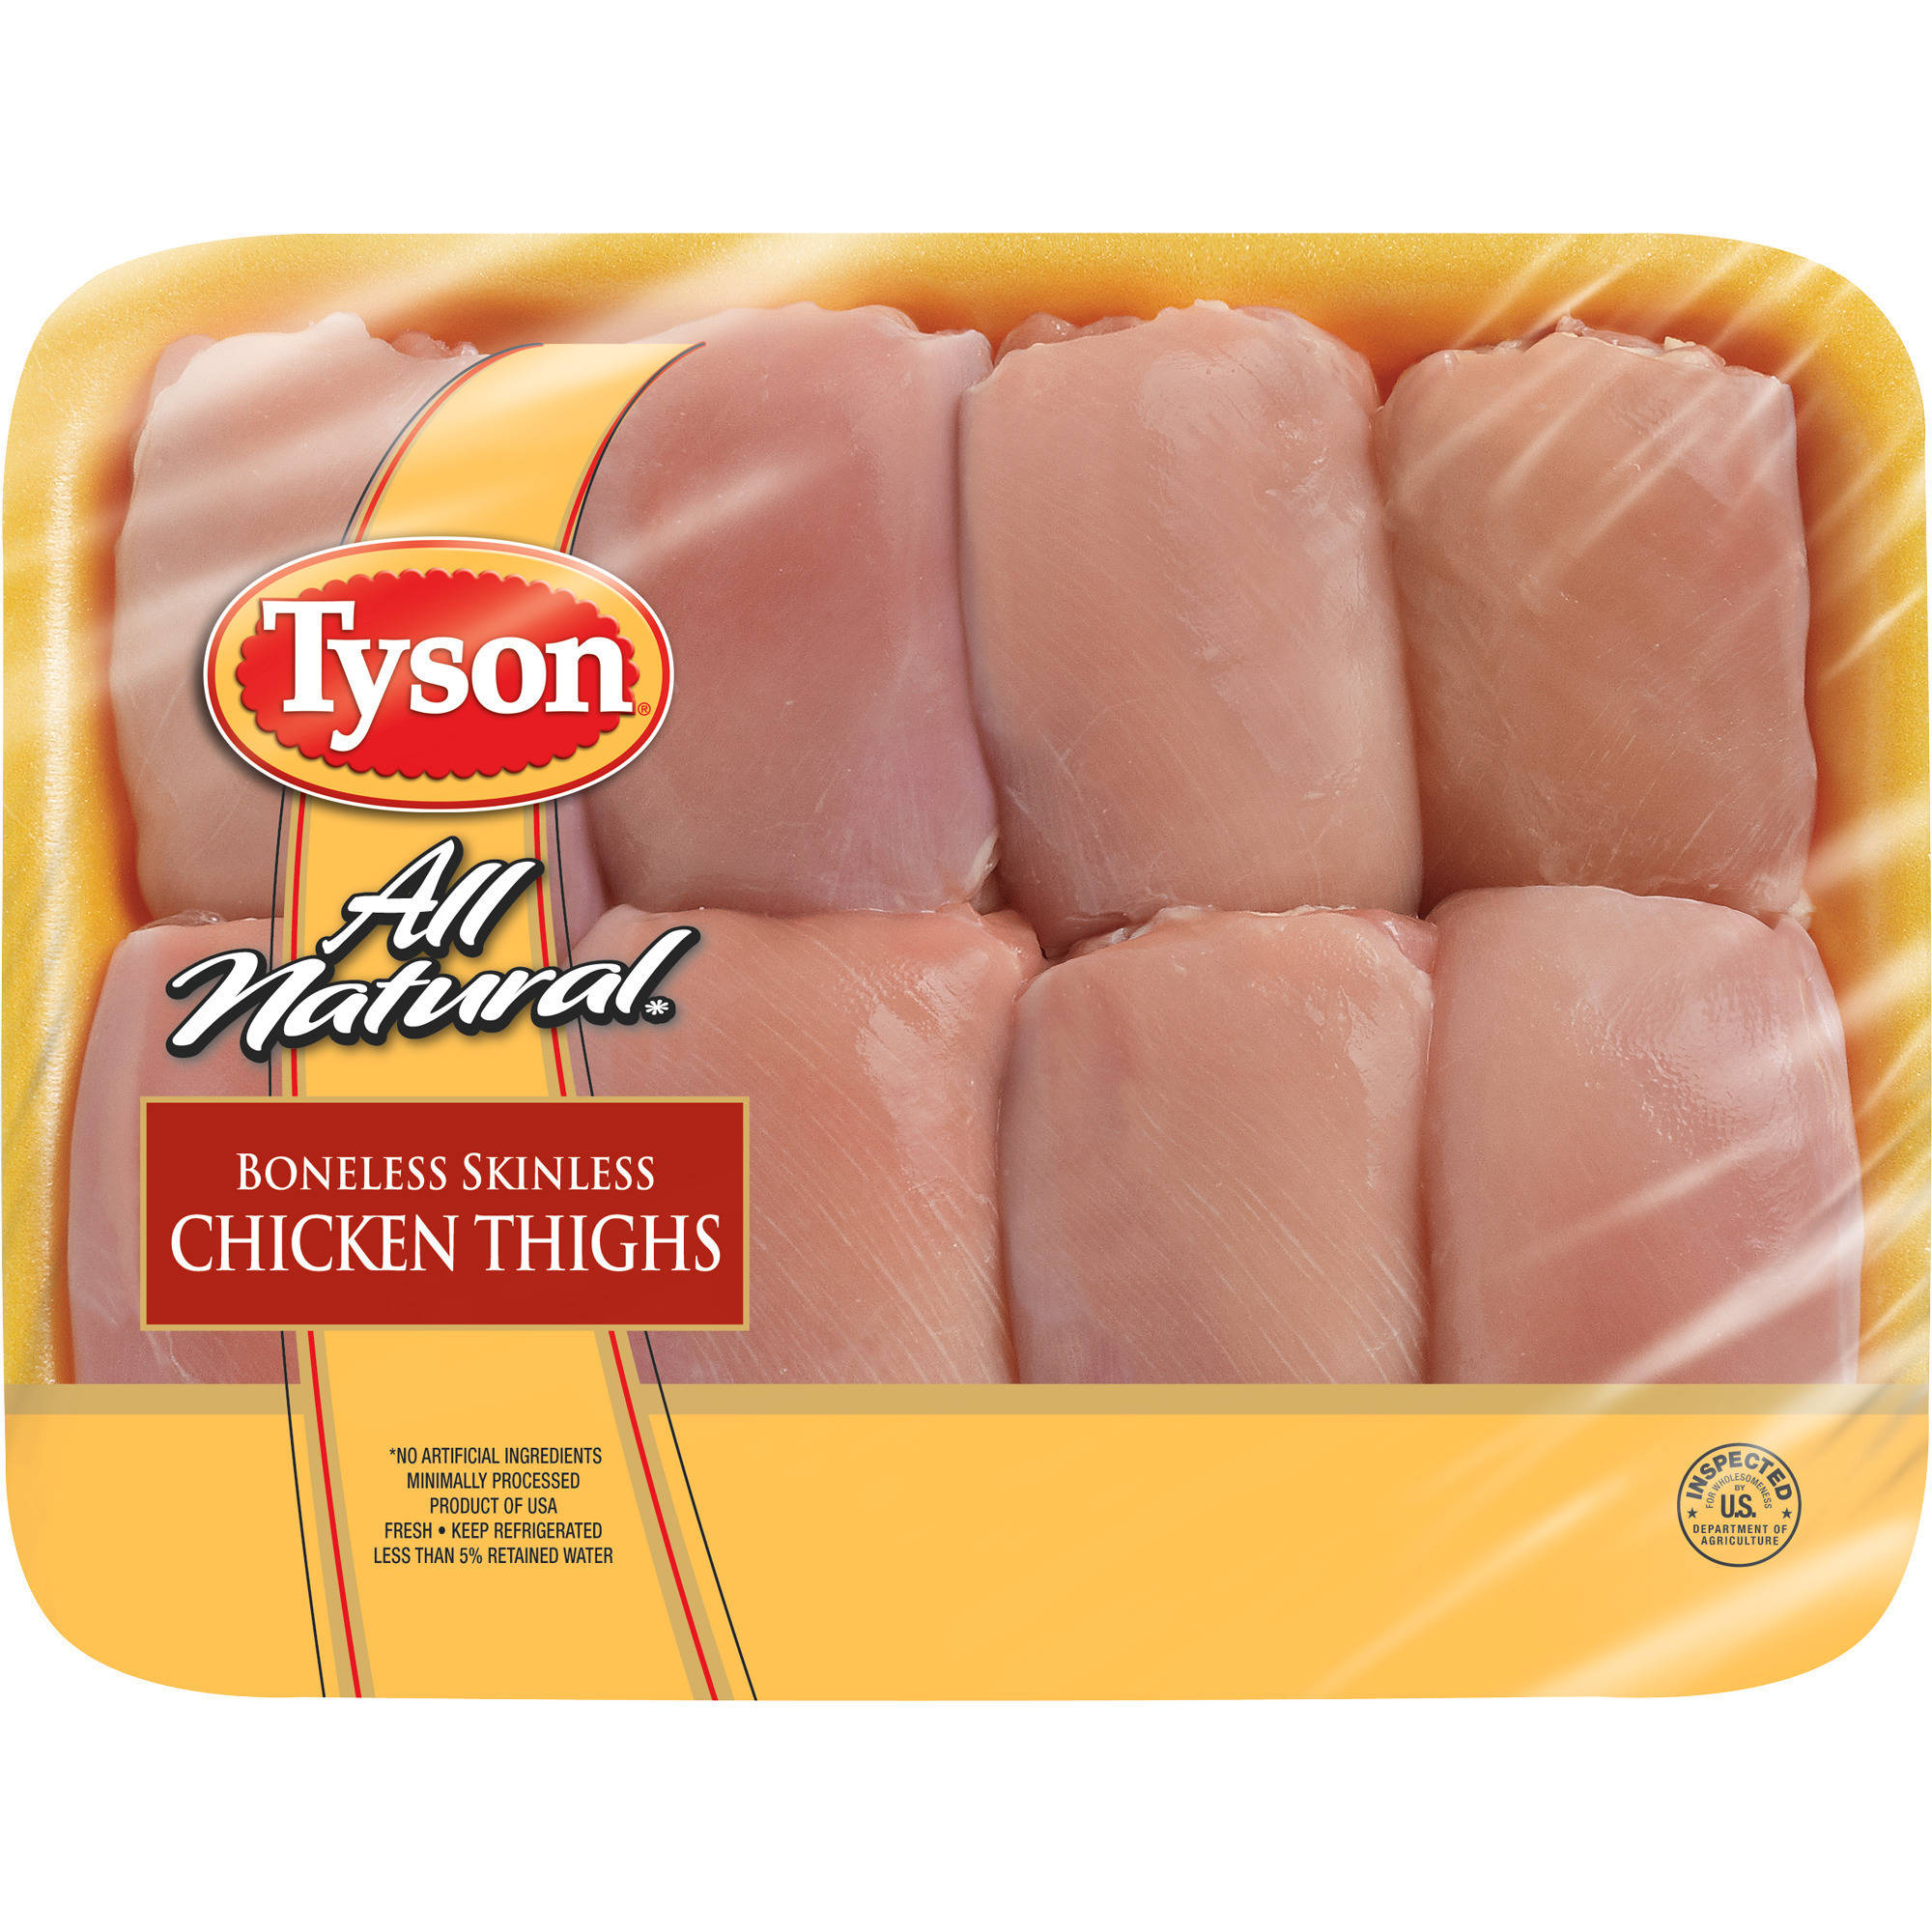 Tyson Boneless Skinless Chicken Thighs 18 lbs Walmartcom